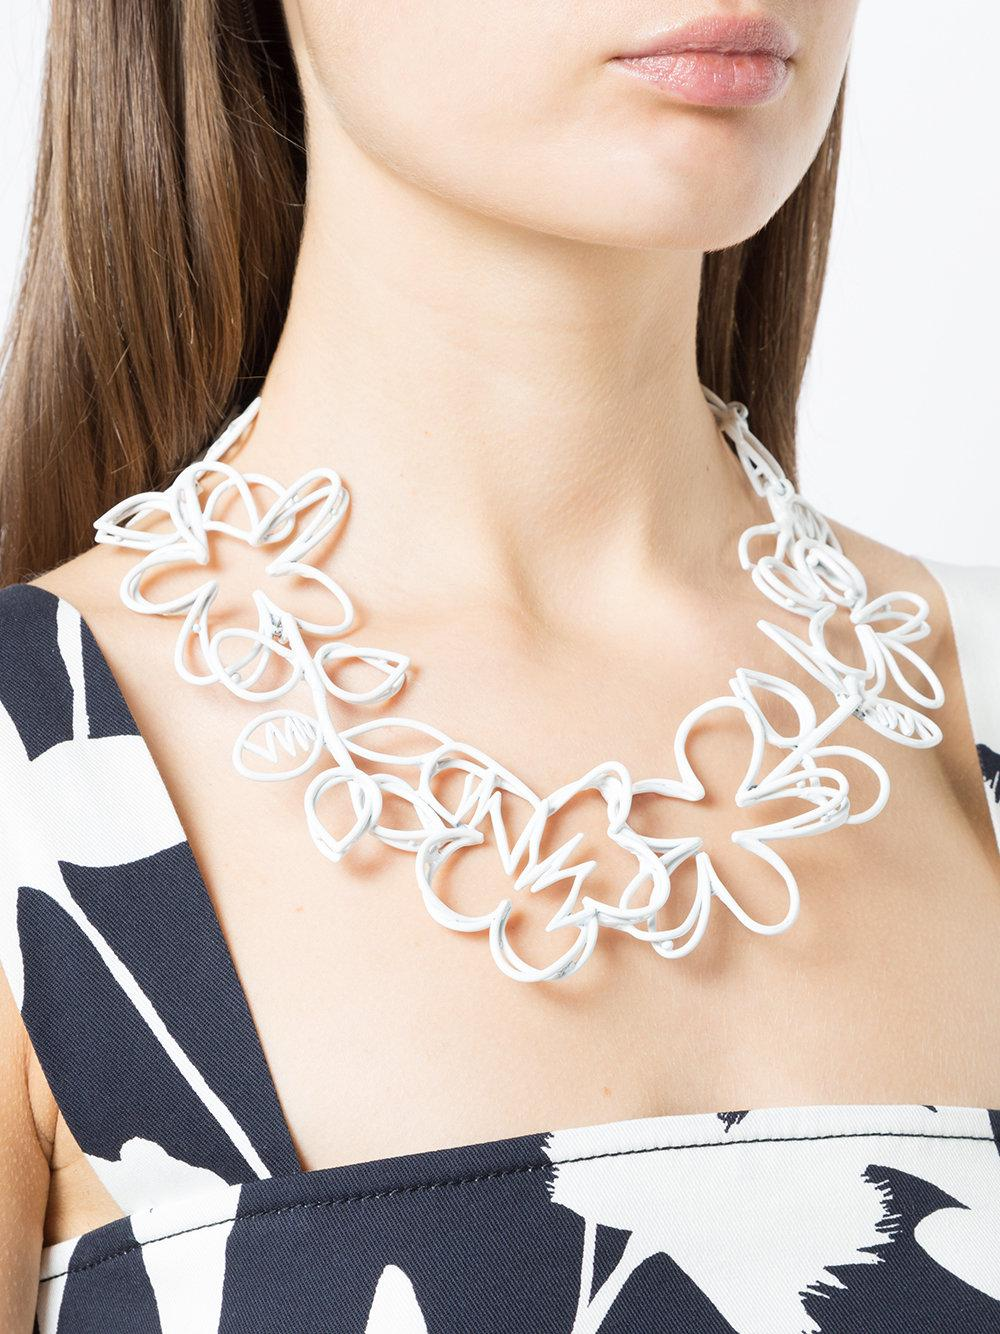 Oscar de la Renta Botanical Scribble Necklace in White